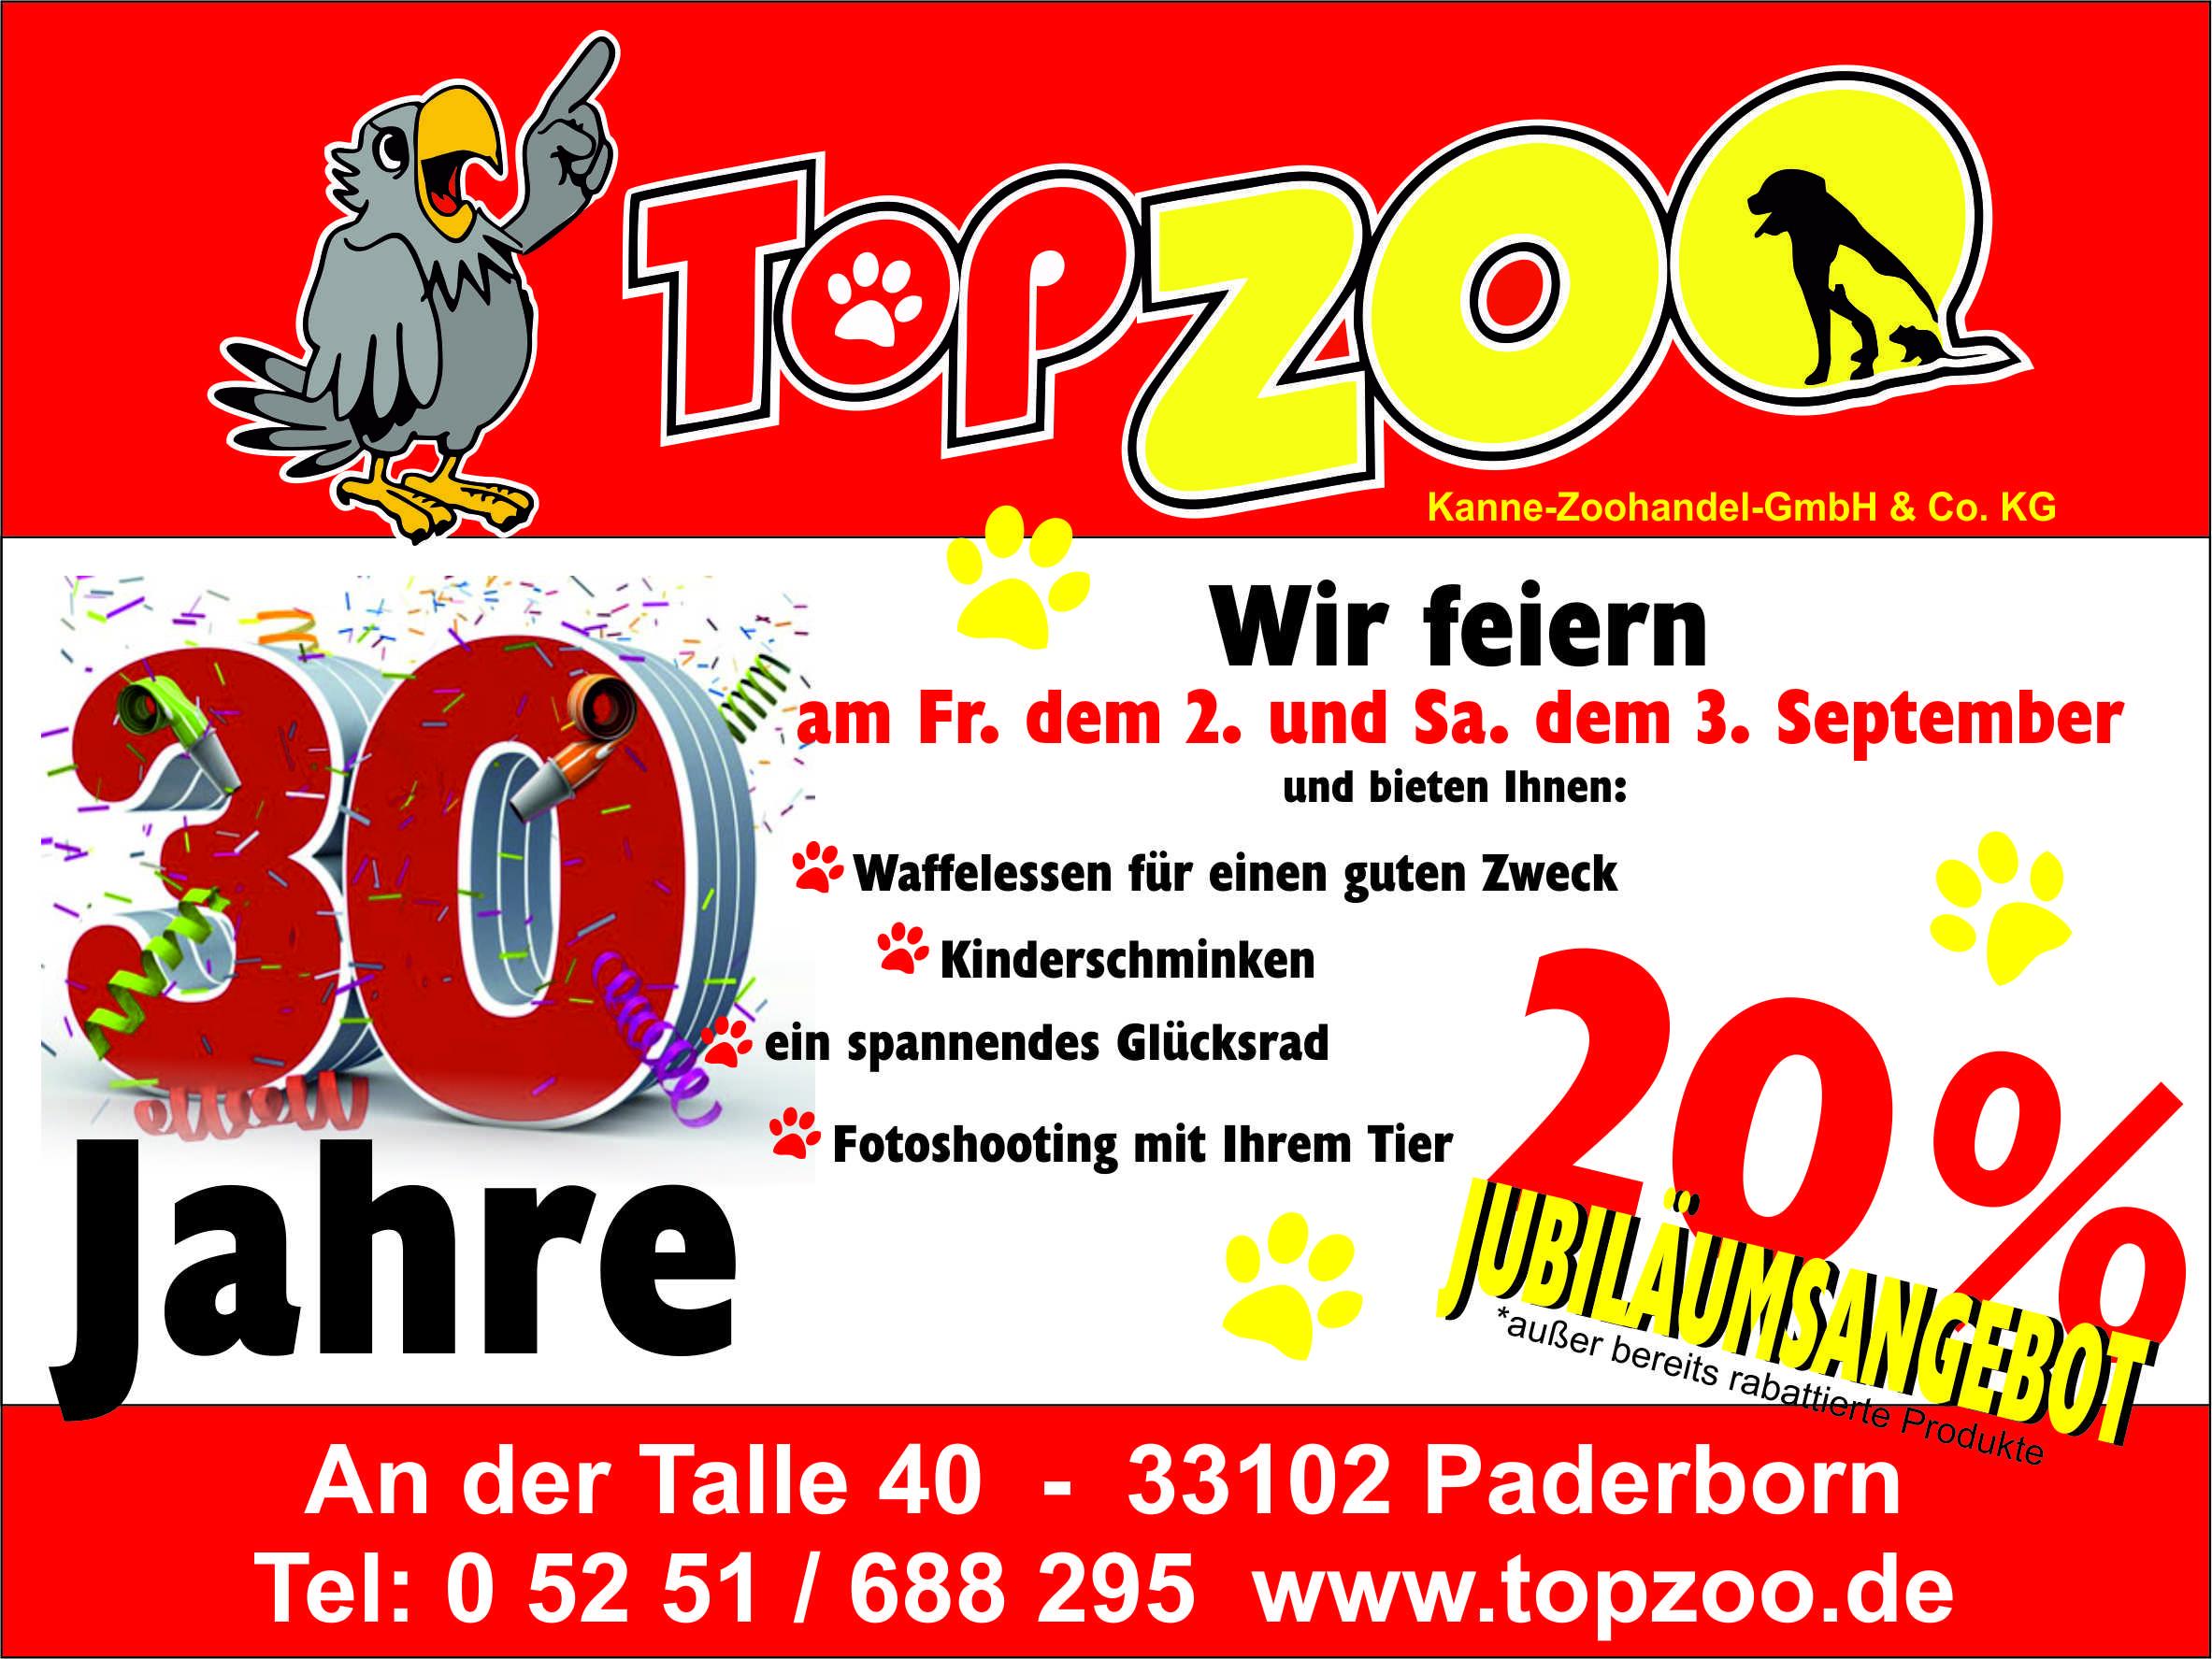 Über 30 Jahre TopZoo